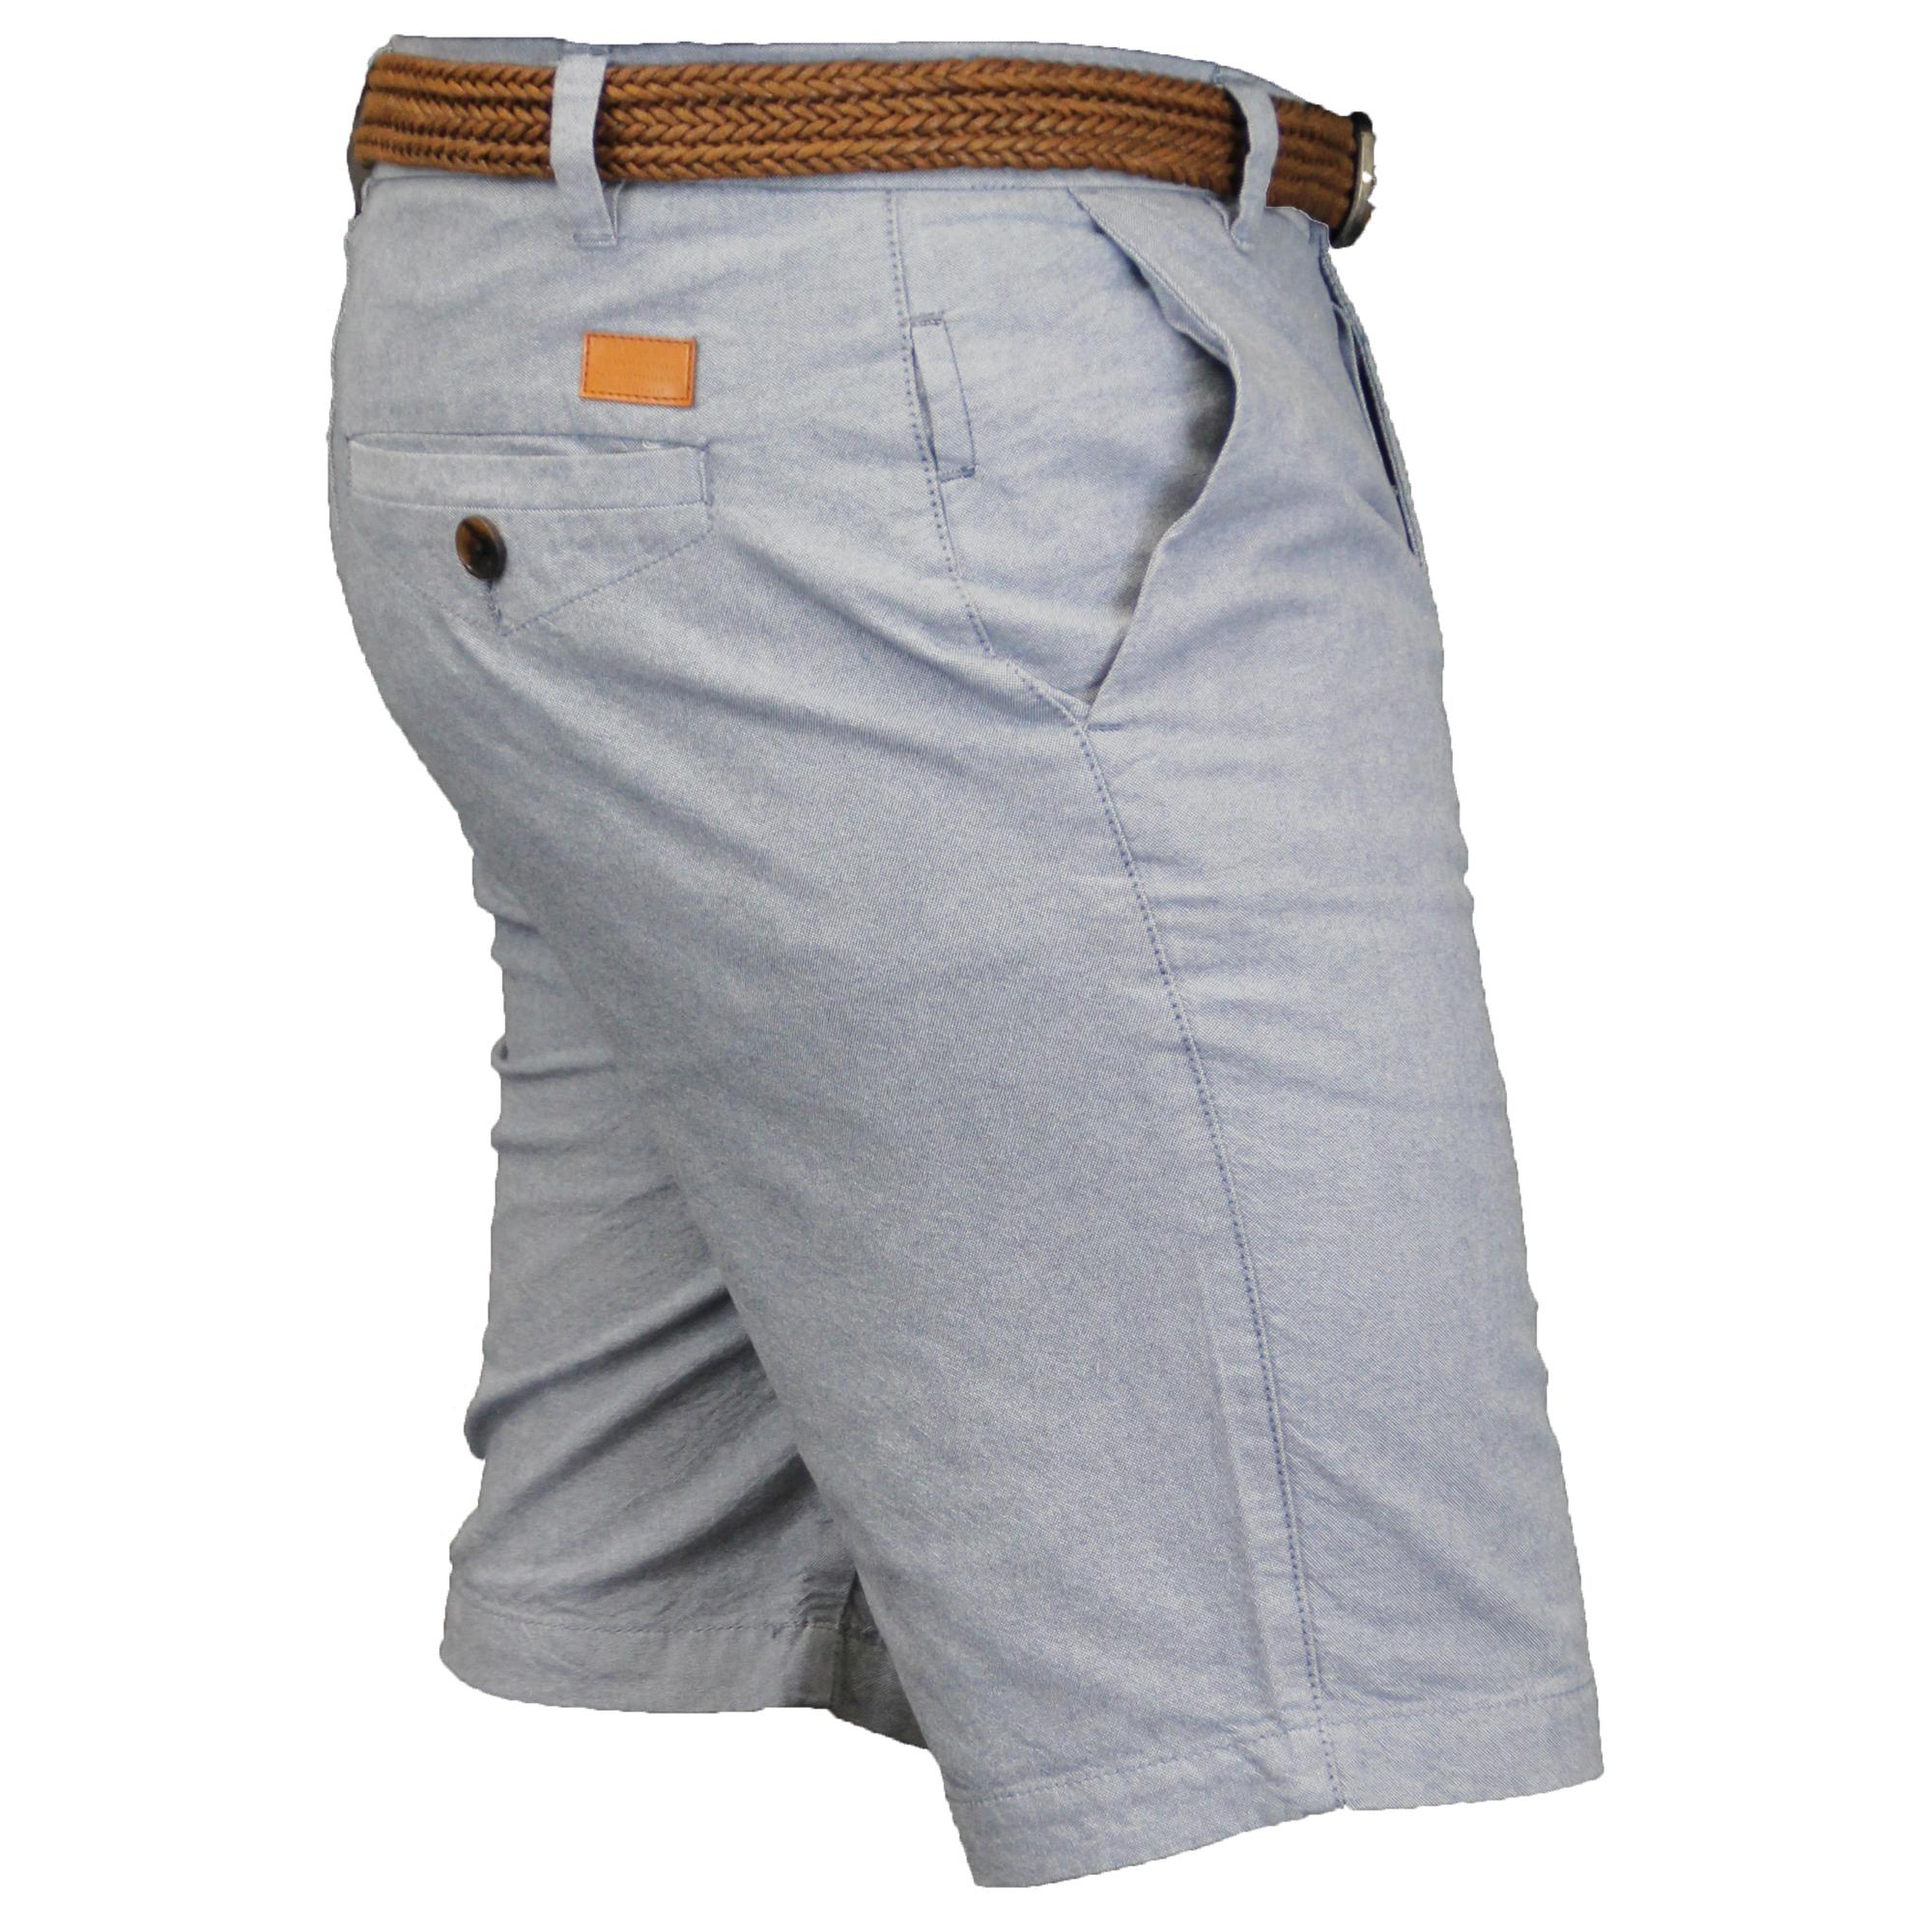 Mens-Cotton-Oxford-Chino-Shorts-Threadbare-Belted-Pants-Knee-Length-Summer-New thumbnail 3